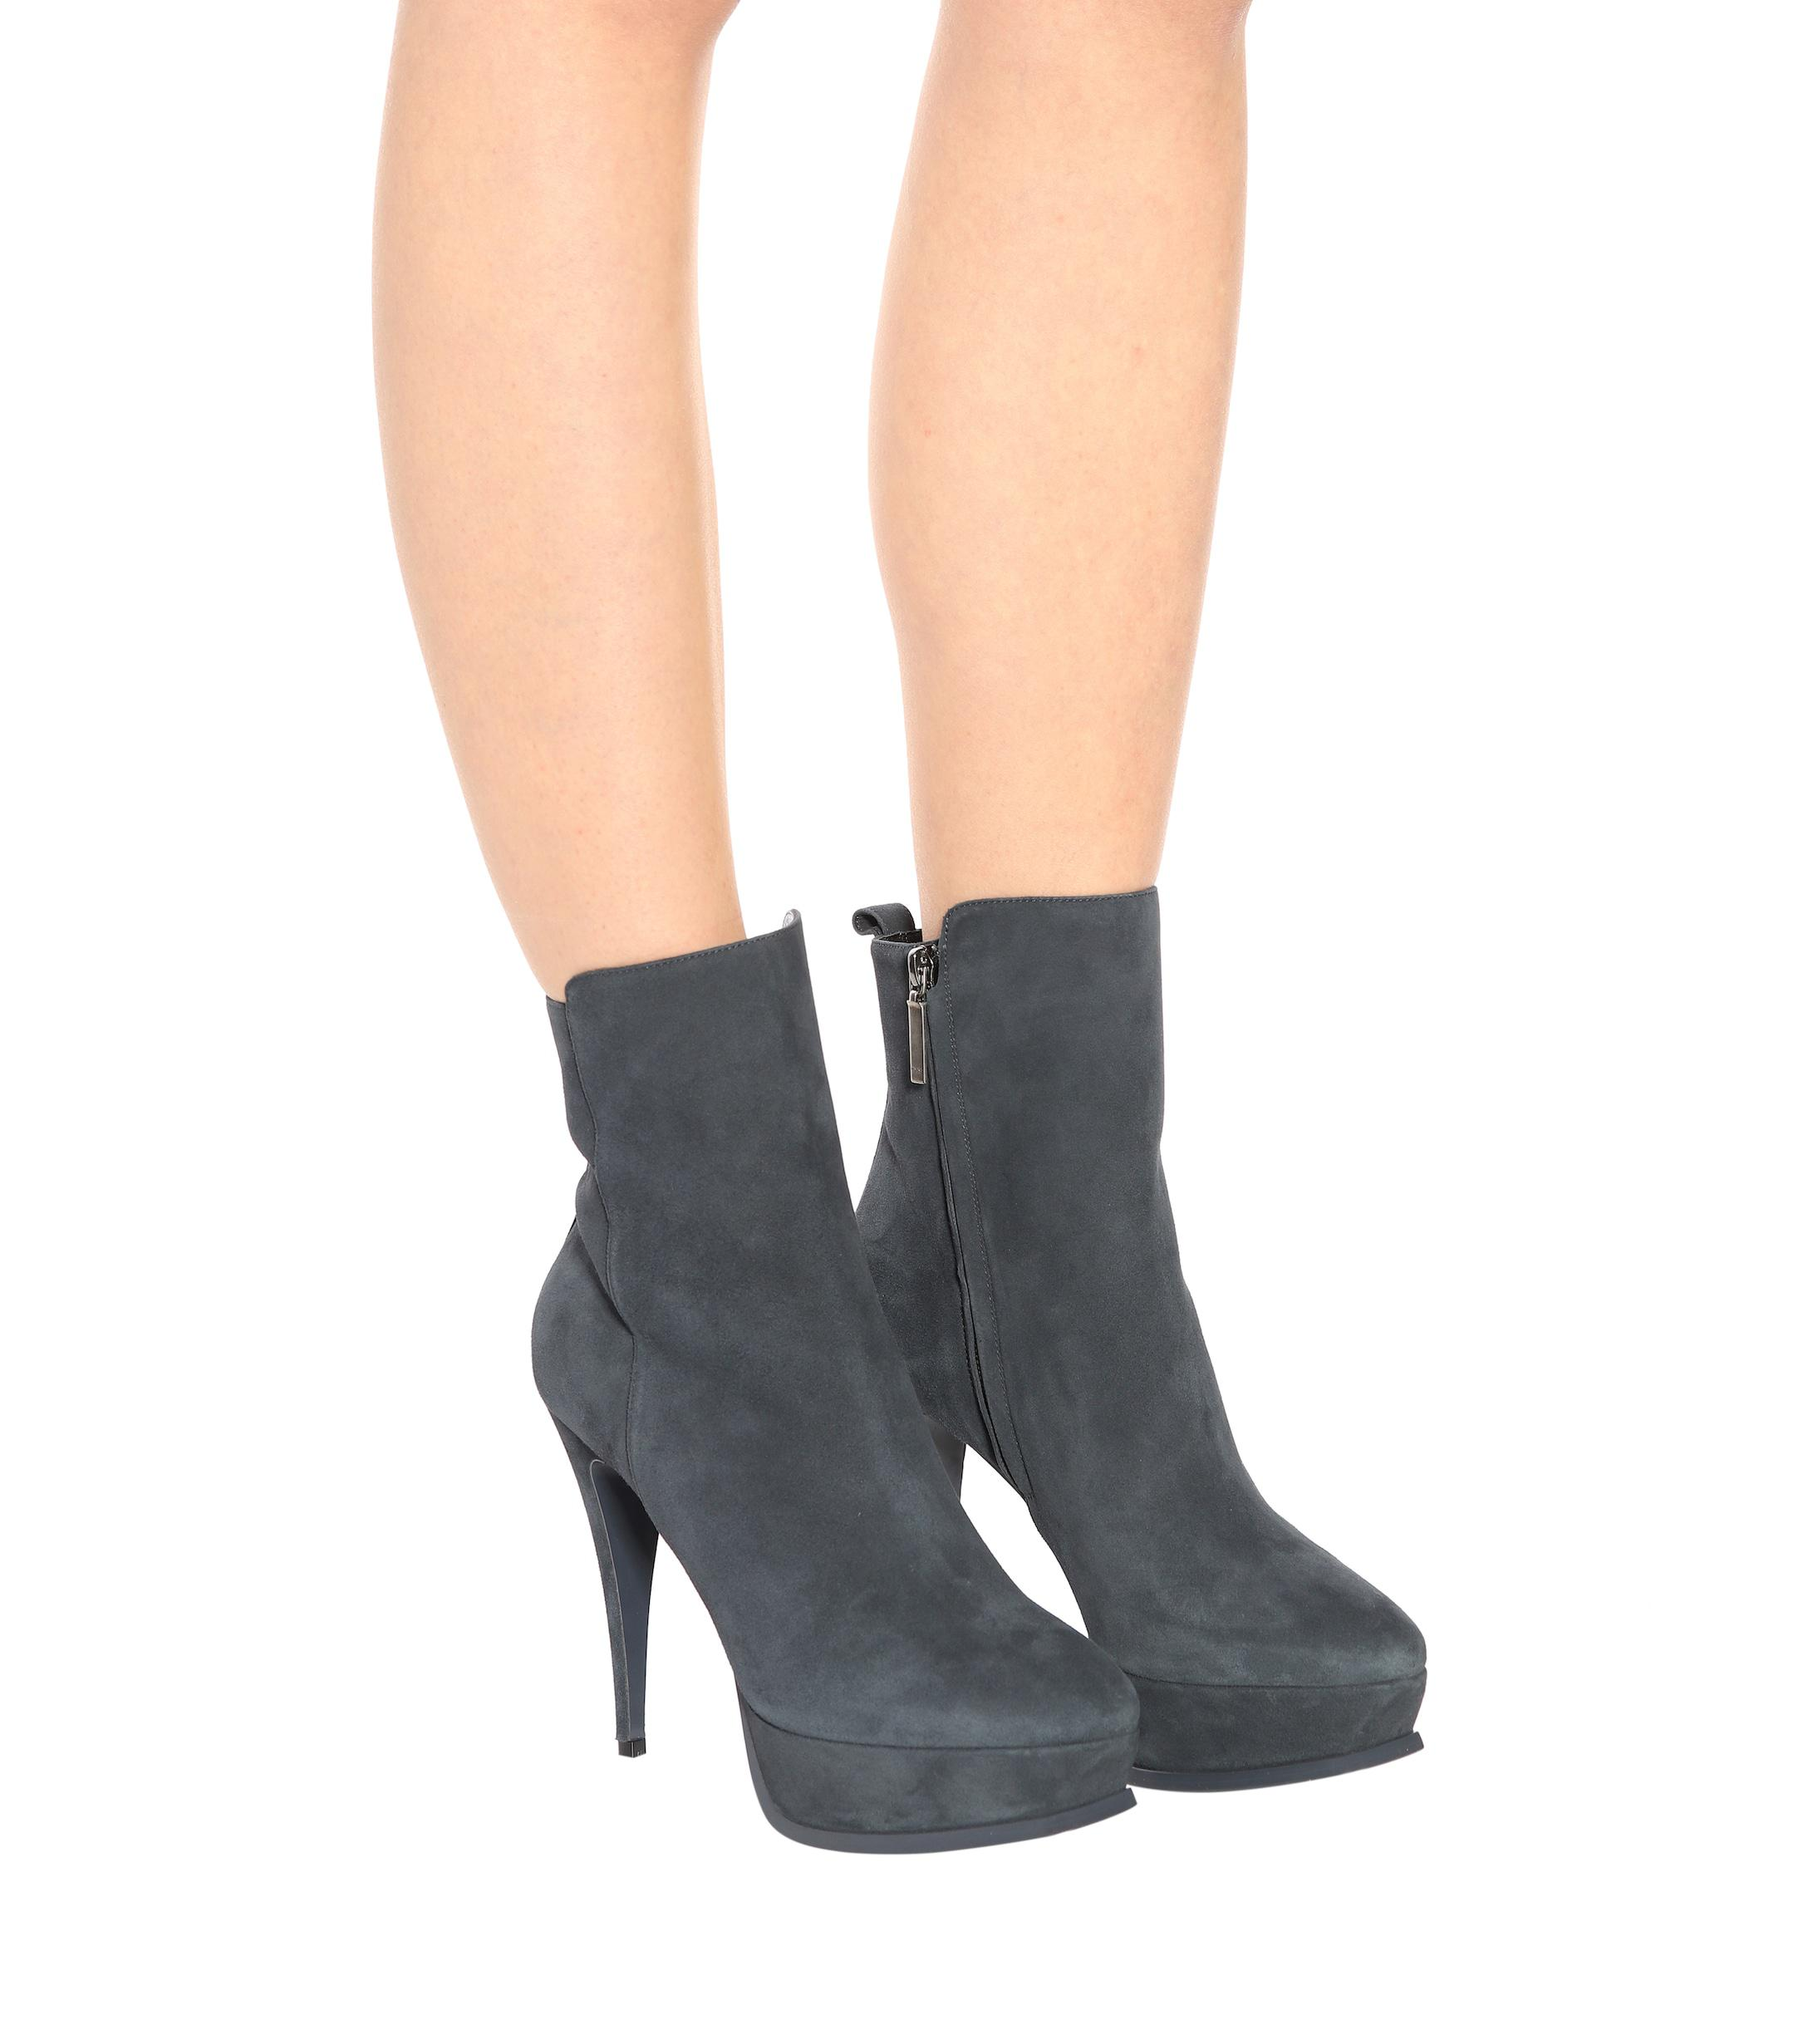 99a81395 Lyst - Saint Laurent Tribute 90 Suede Ankle Boots